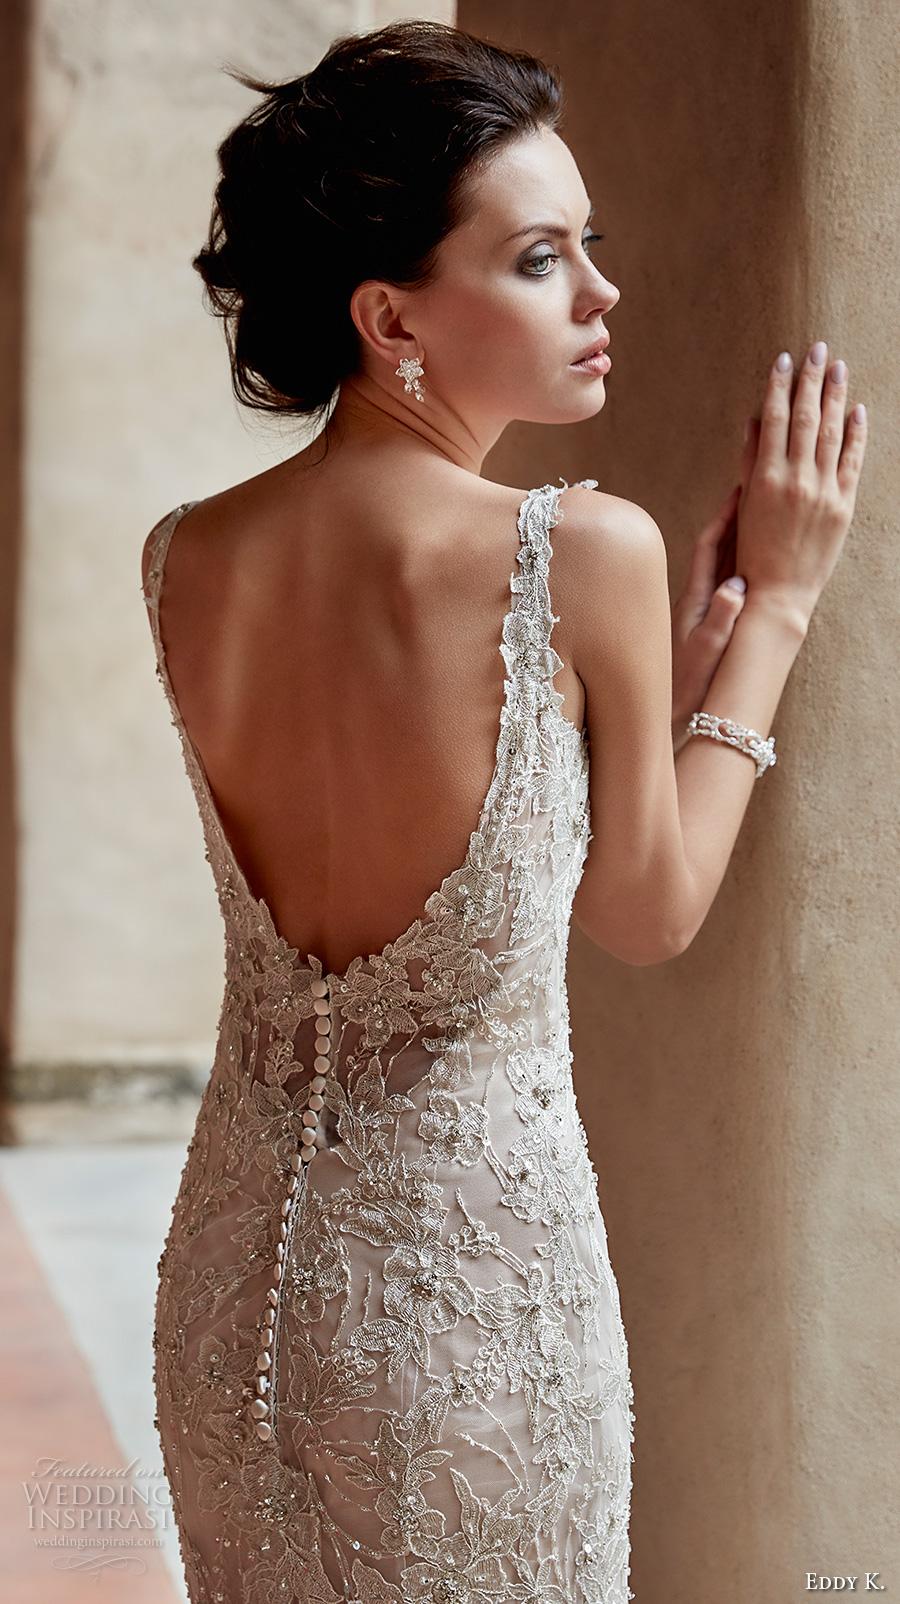 Wedding Gowns Portland Oregon 92 Vintage eddy k couture bridal